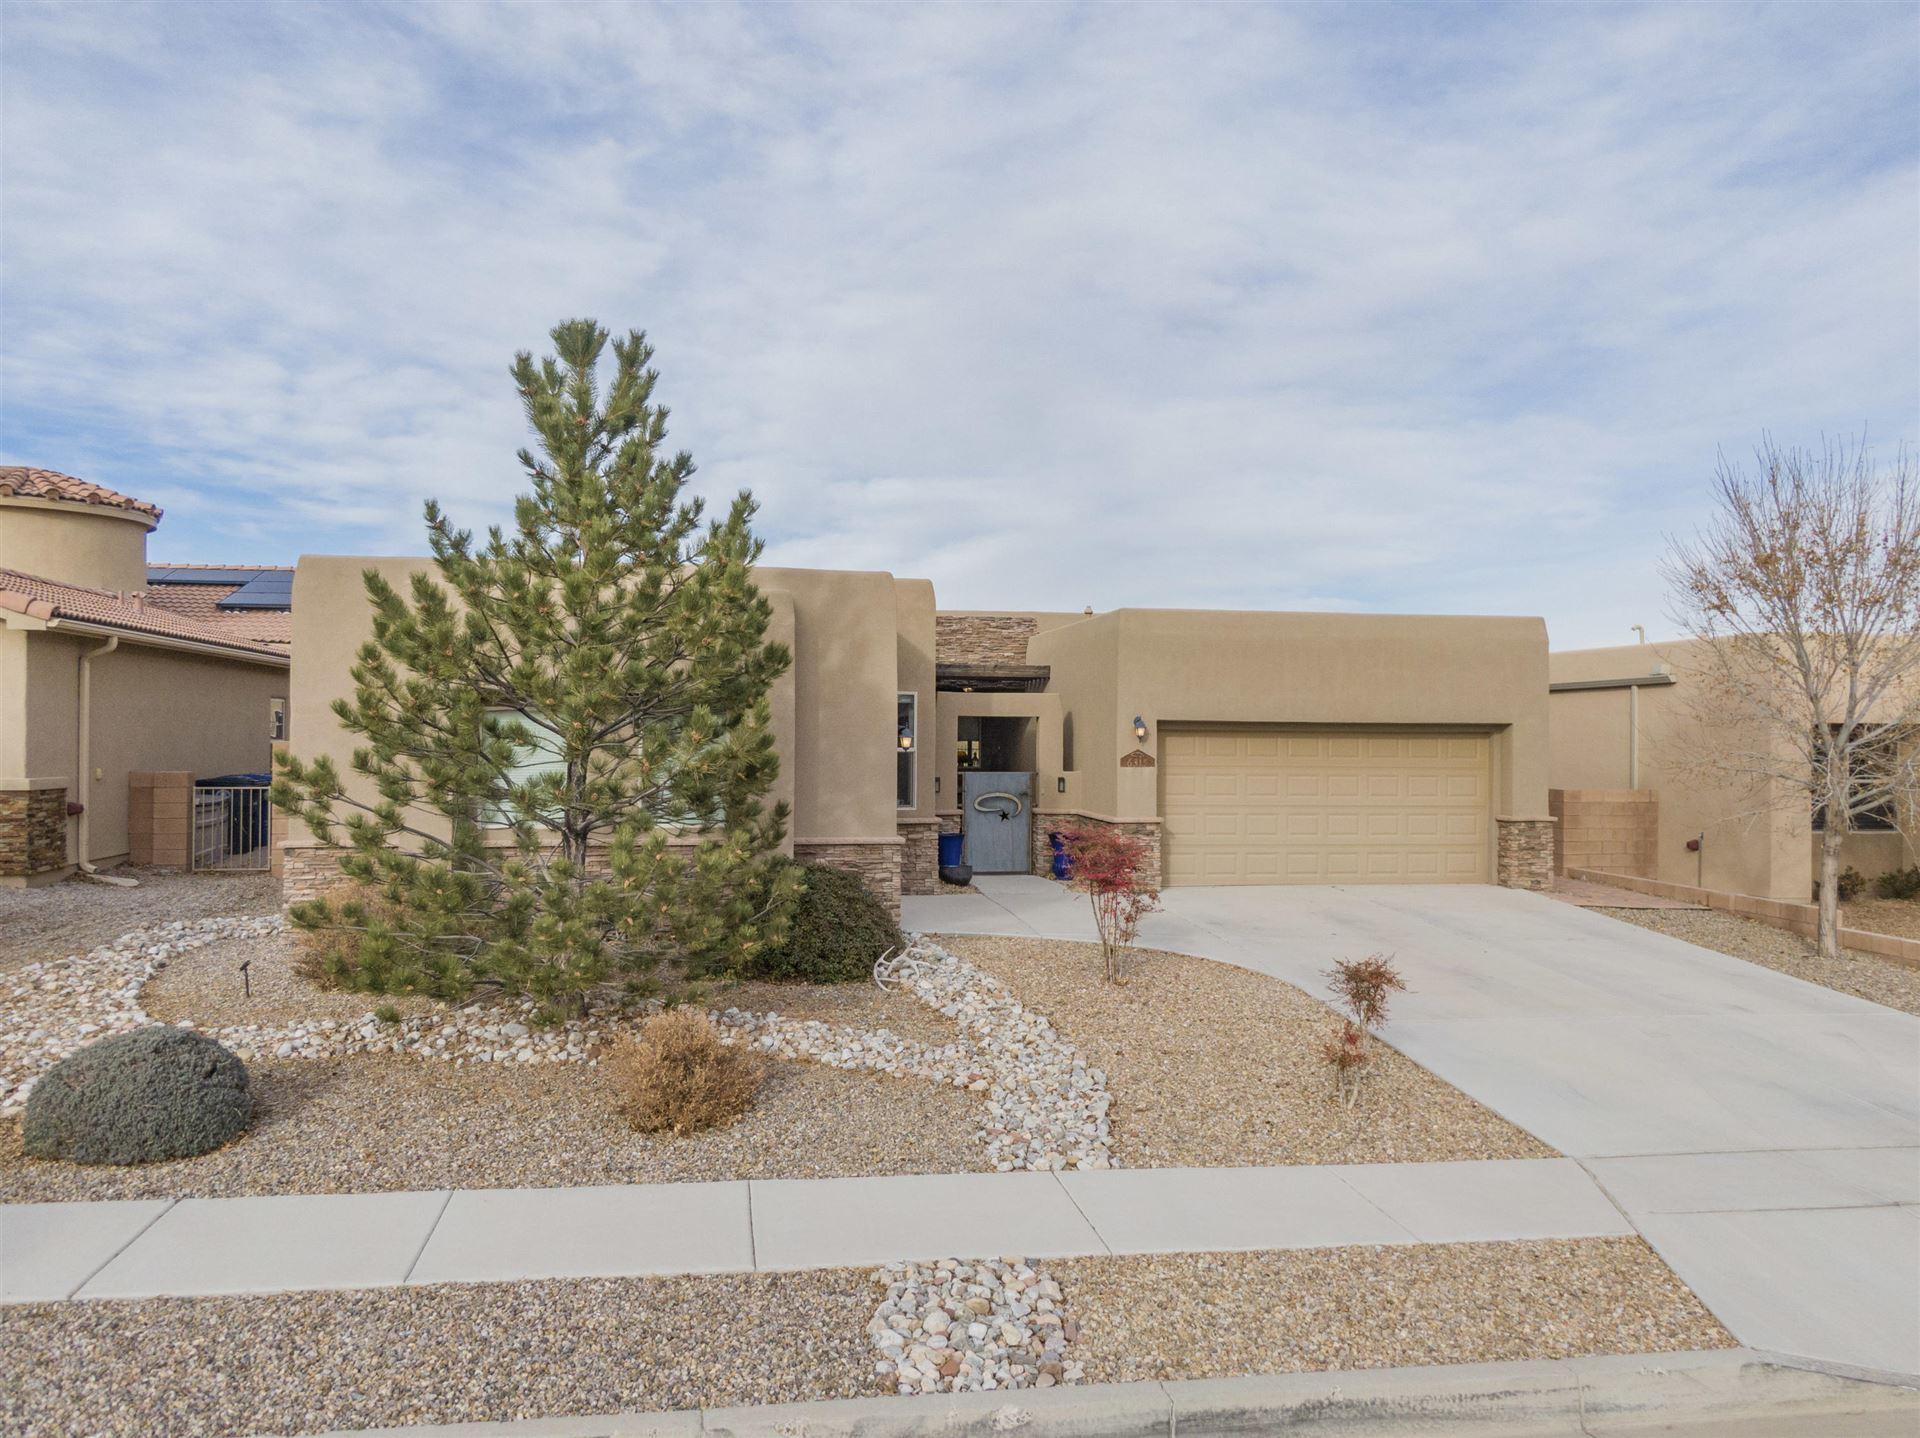 Photo of 6315 CAMINO DE PAZ Road NW, Albuquerque, NM 87120 (MLS # 984055)